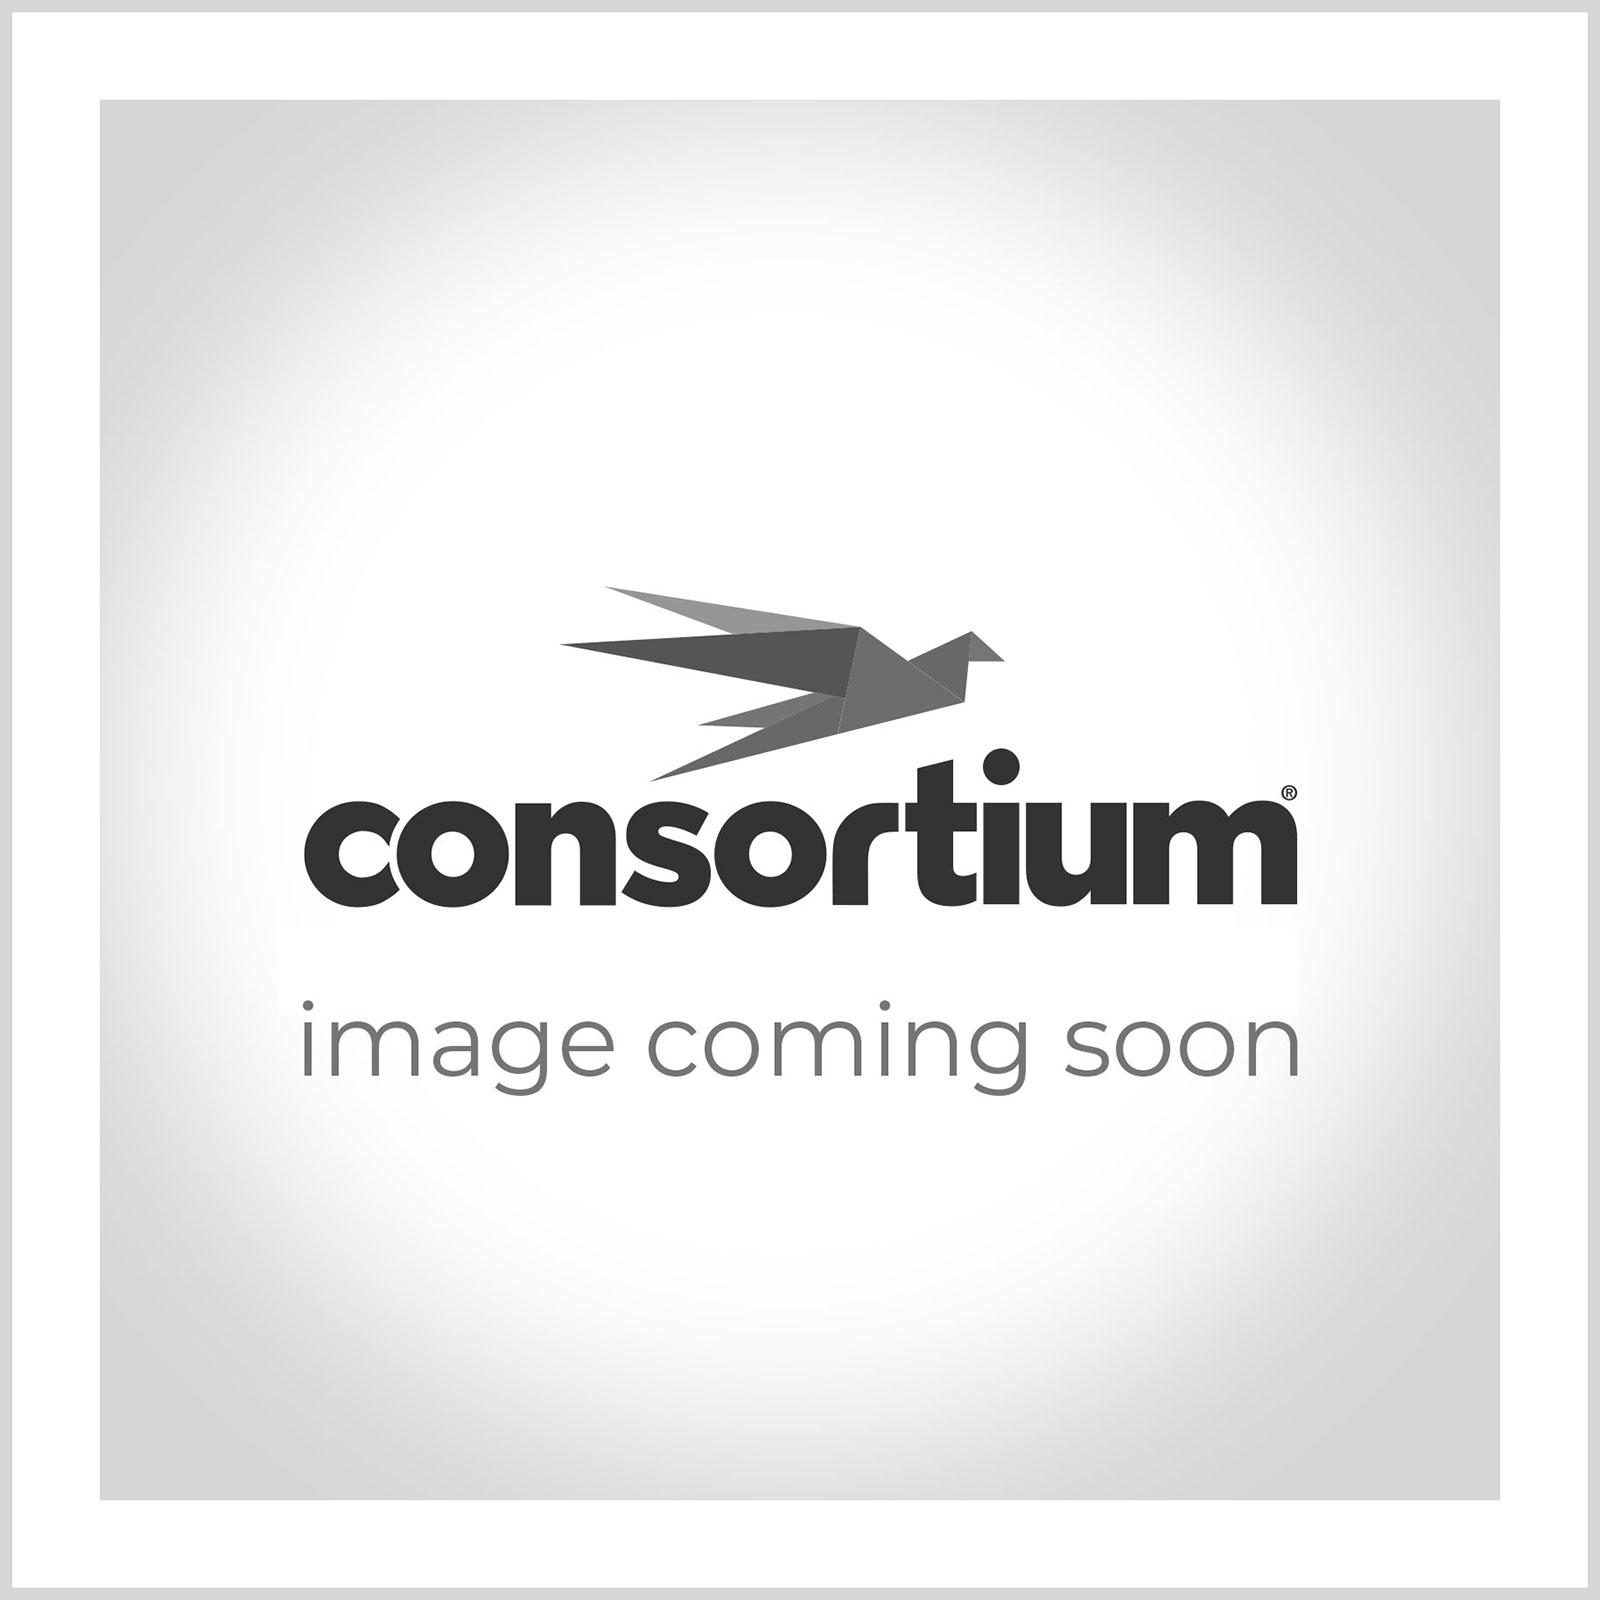 Consortium Poster Paper Sheets - 510mm x 760mm